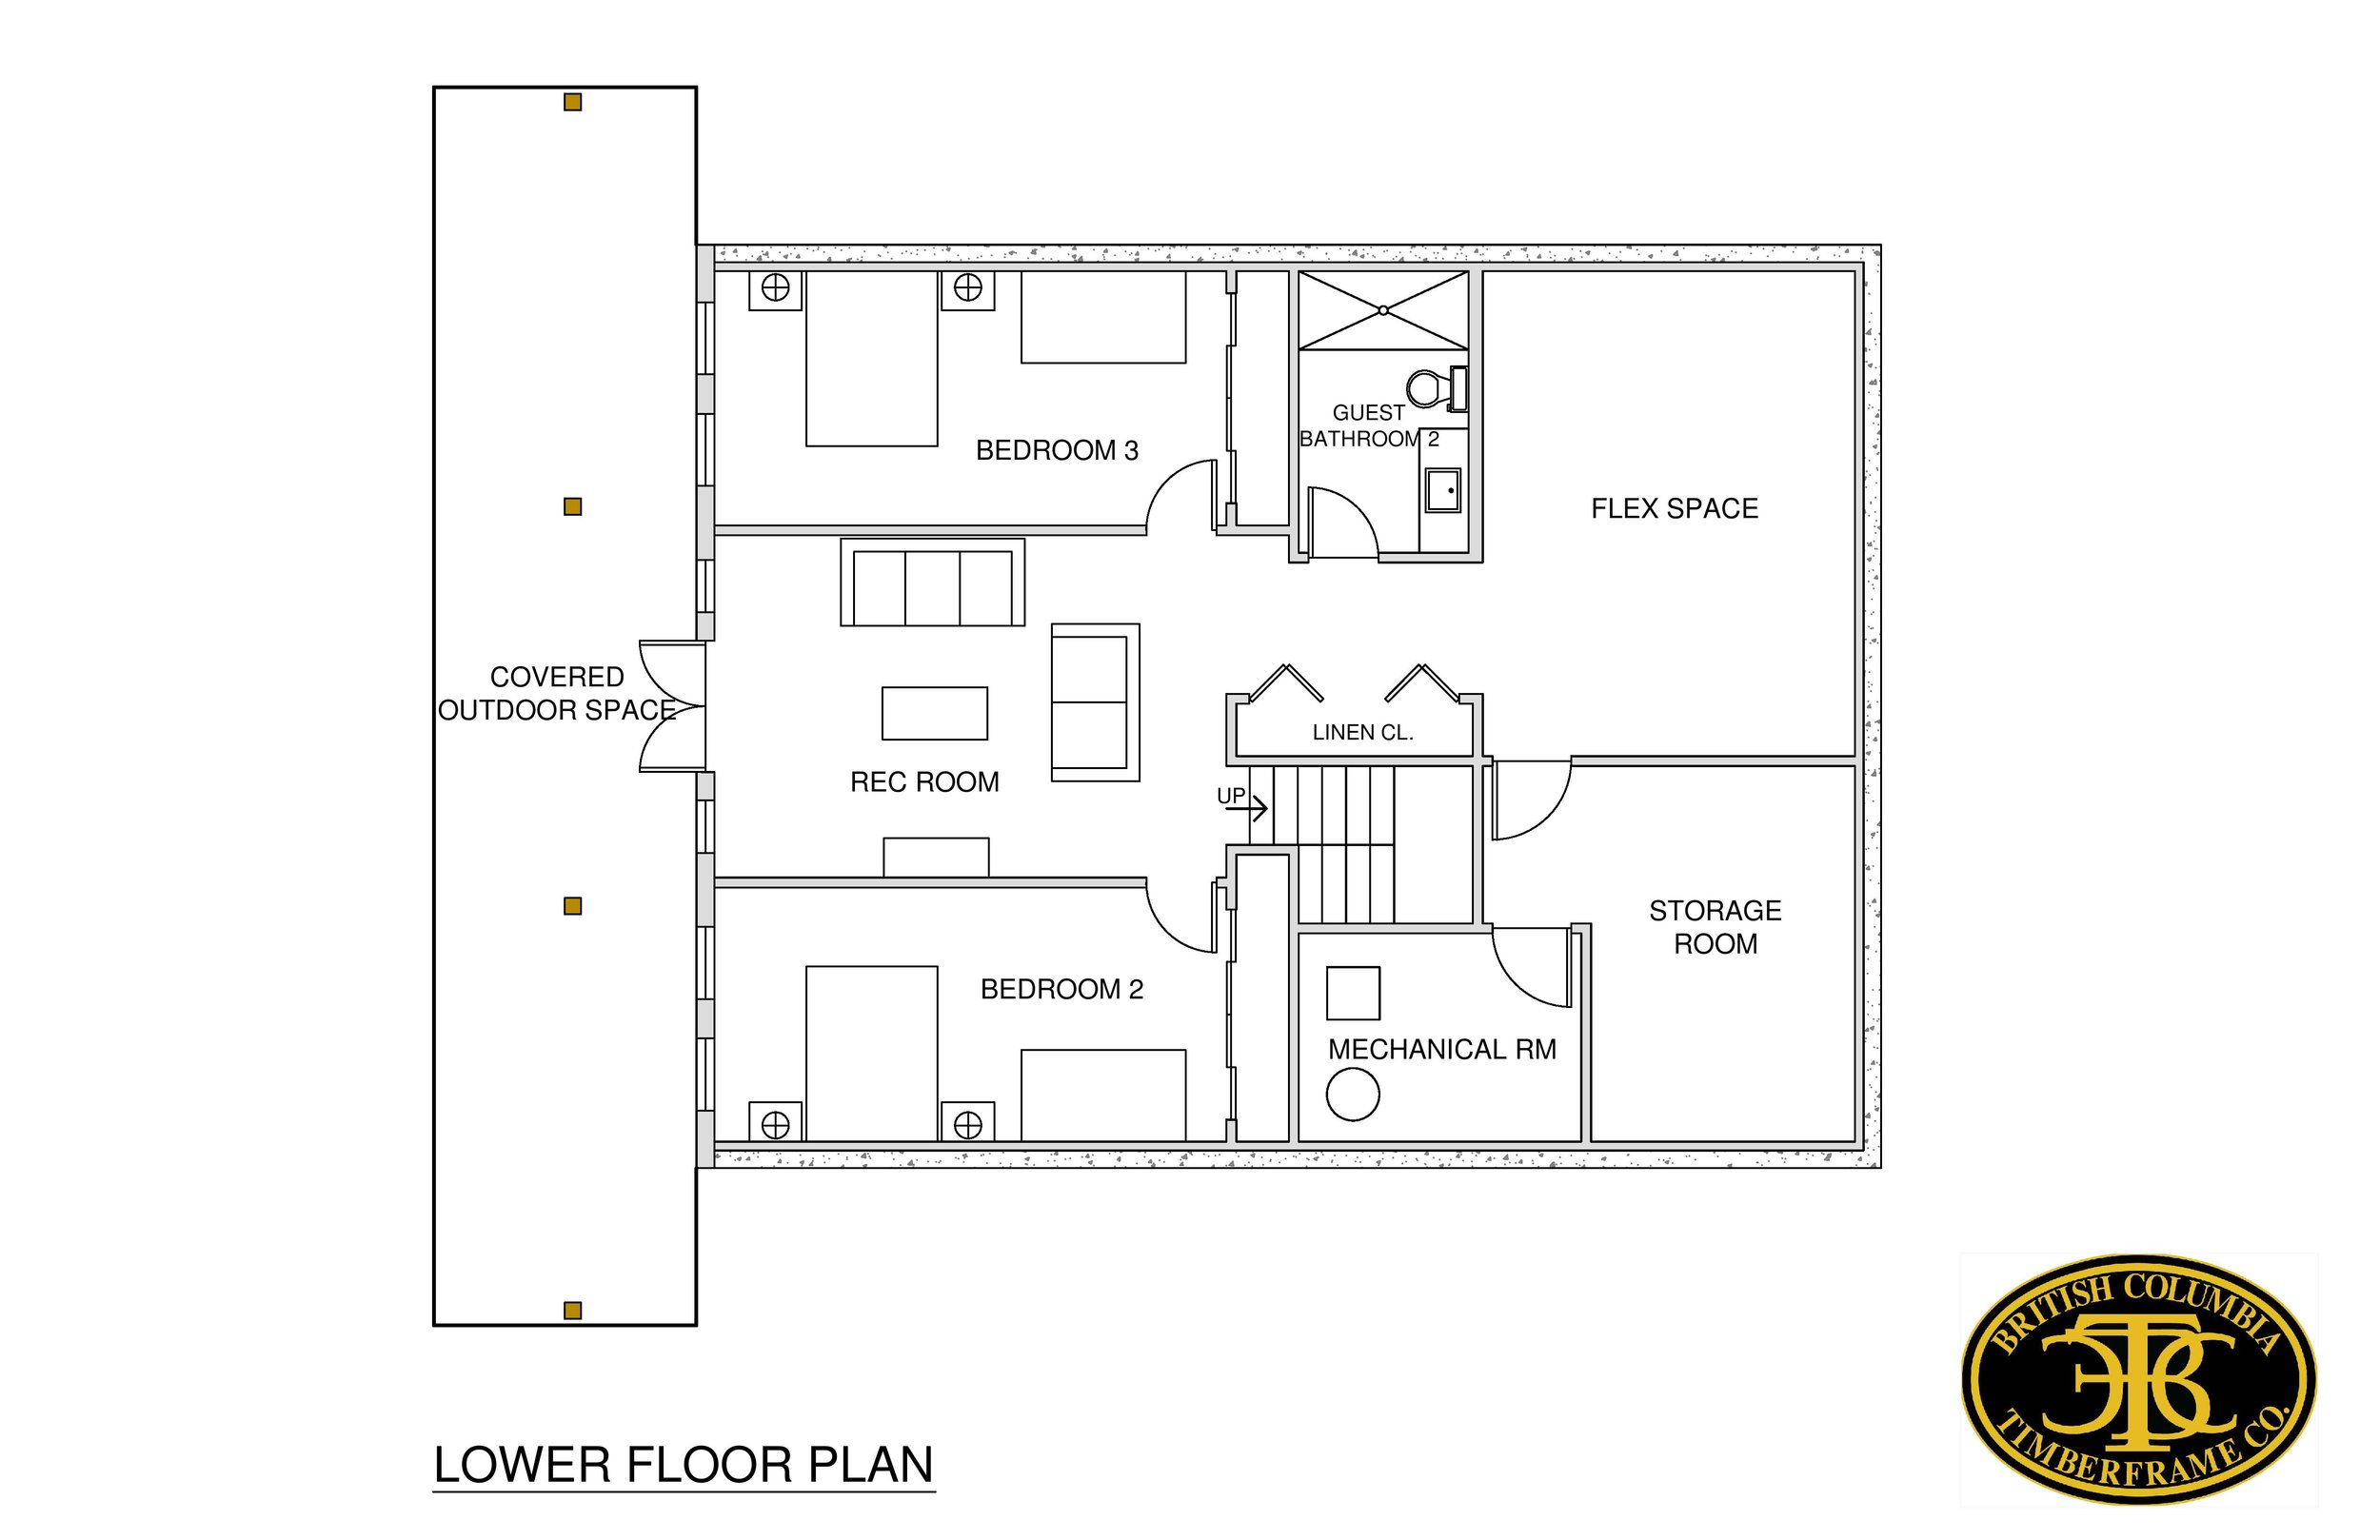 Cranbrook_Lower Floor Plan-page-001.jpg